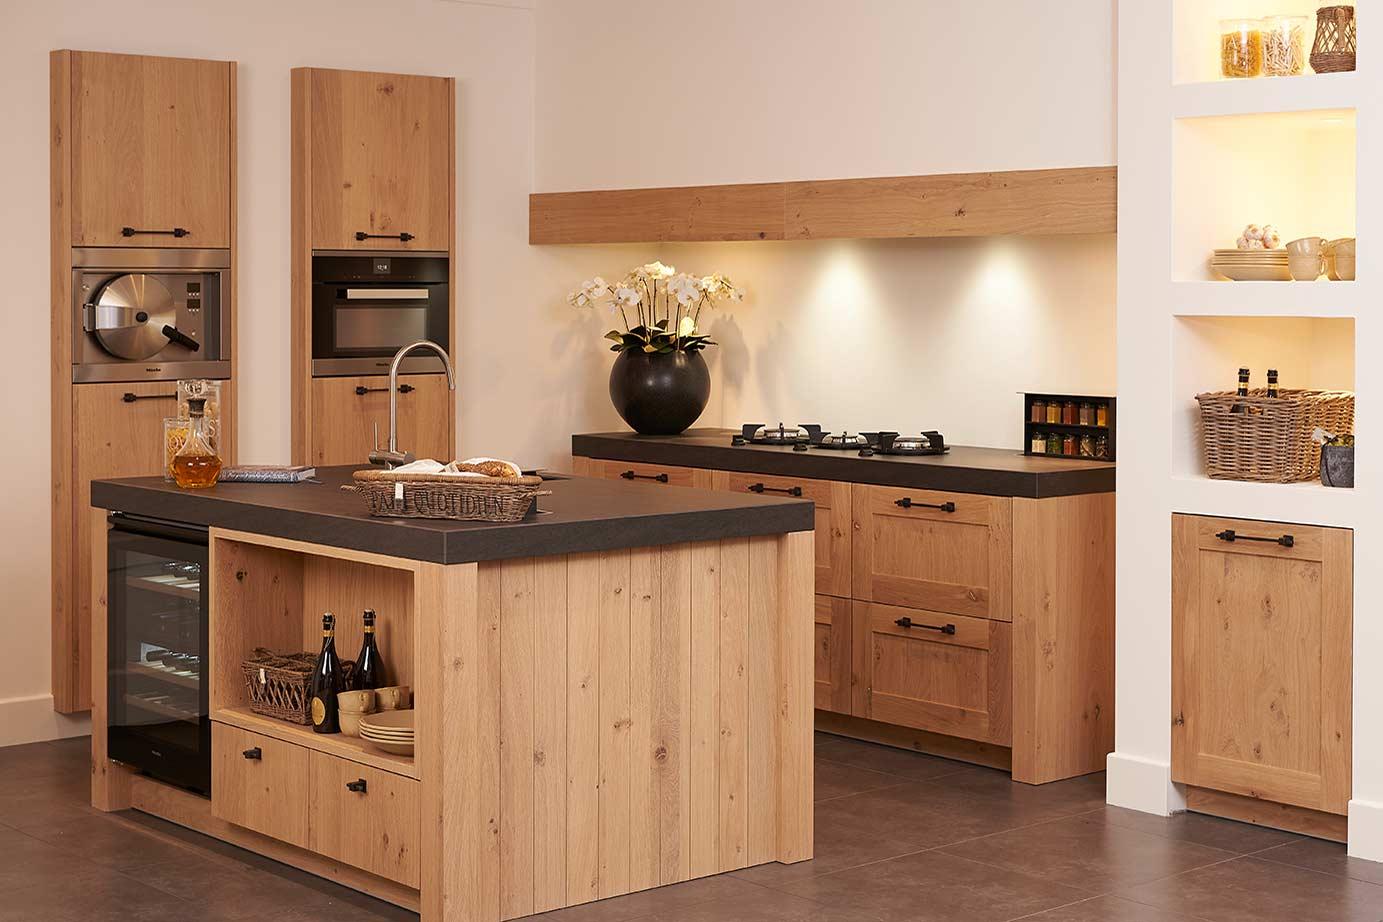 Moderne keuken hout modern witte keuken met een warm houten accent